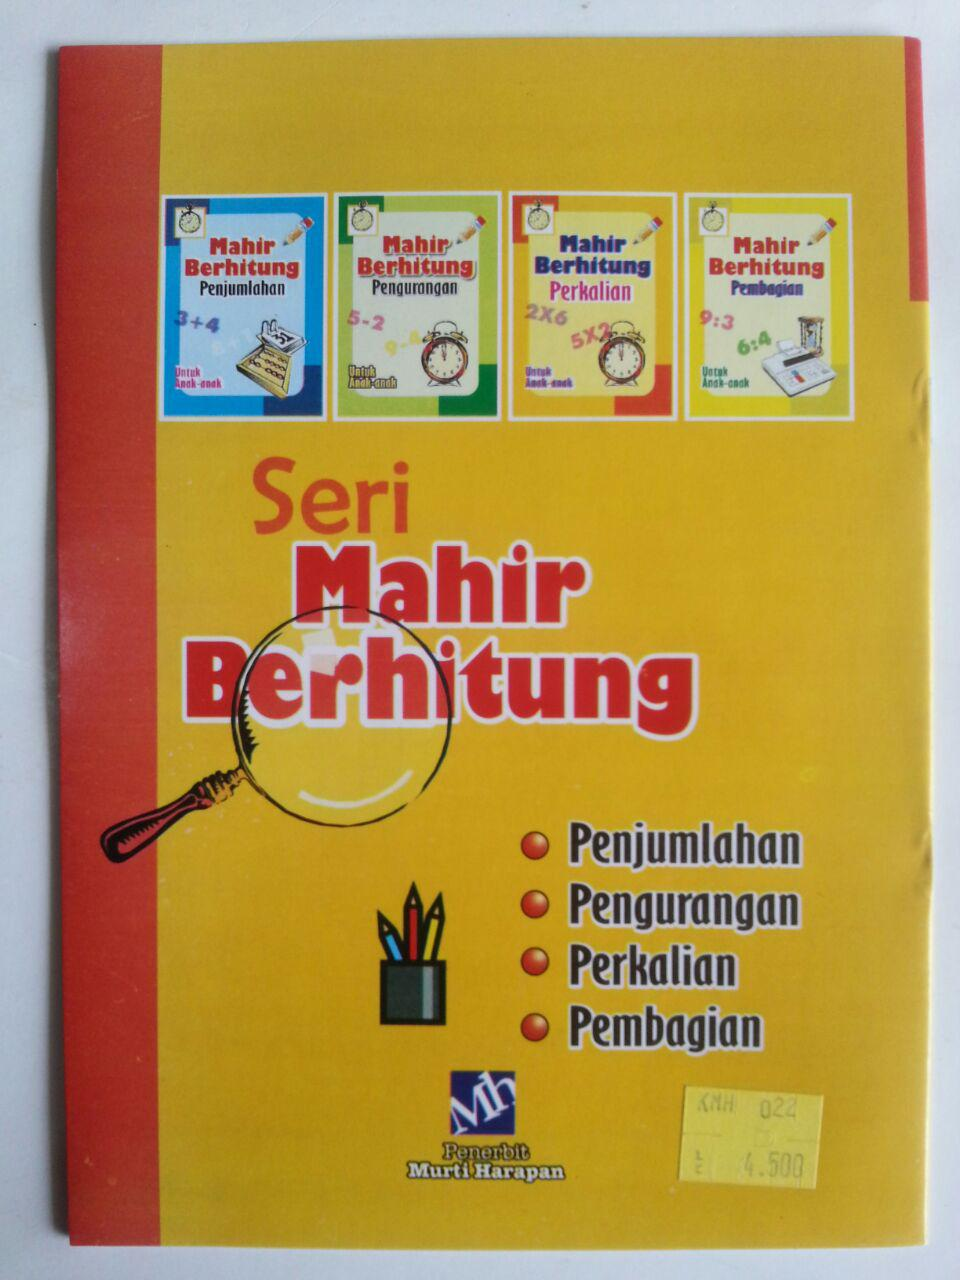 Buku Mahir Berhitung Perkalian Untuk Anak-Anak cover 2